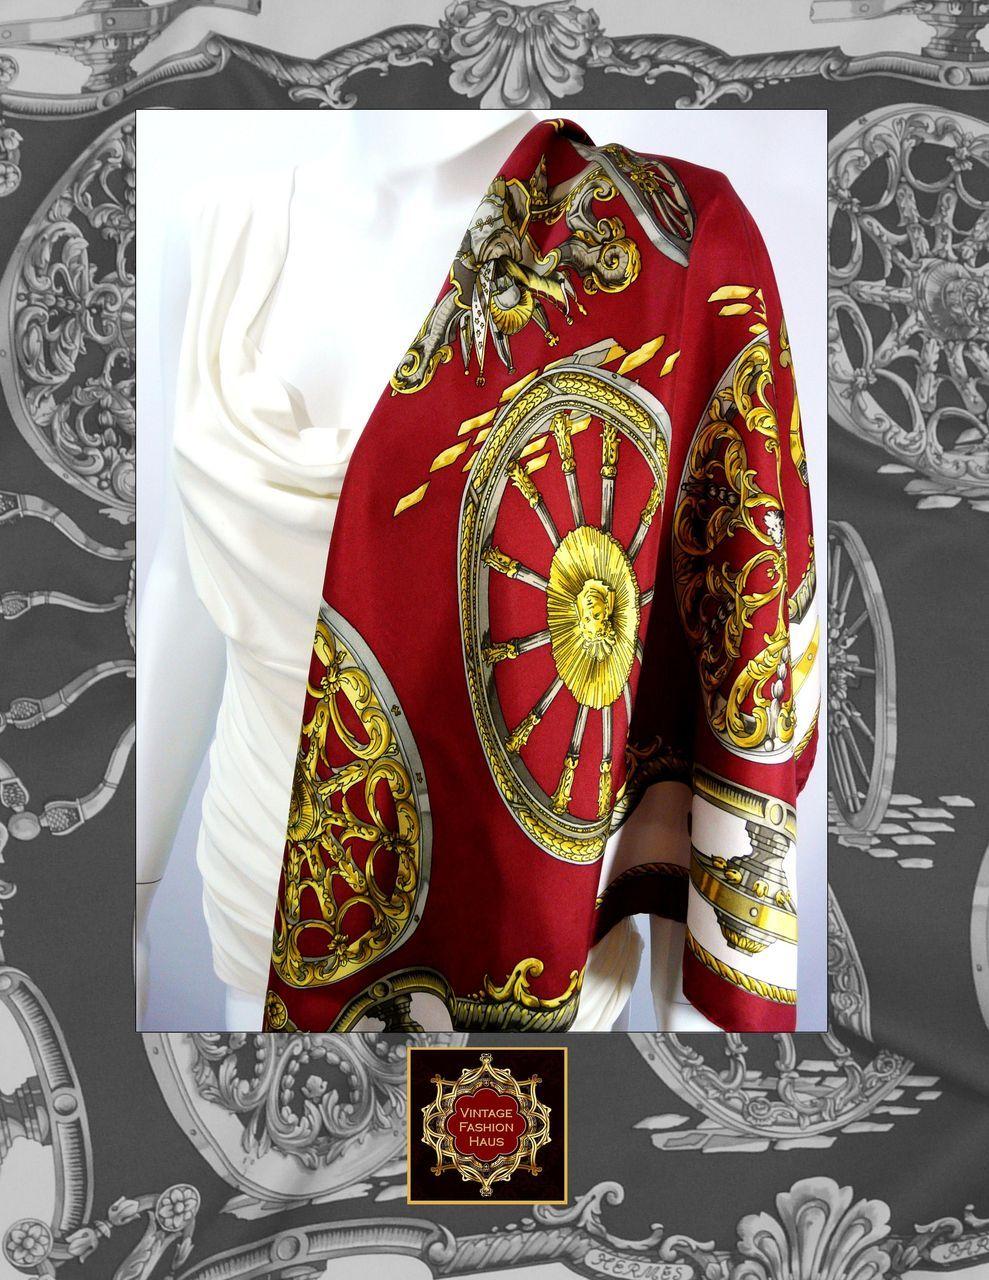 authentic vintage hermes silk scarf carre canon Authentic Vintage Hermes Scarves